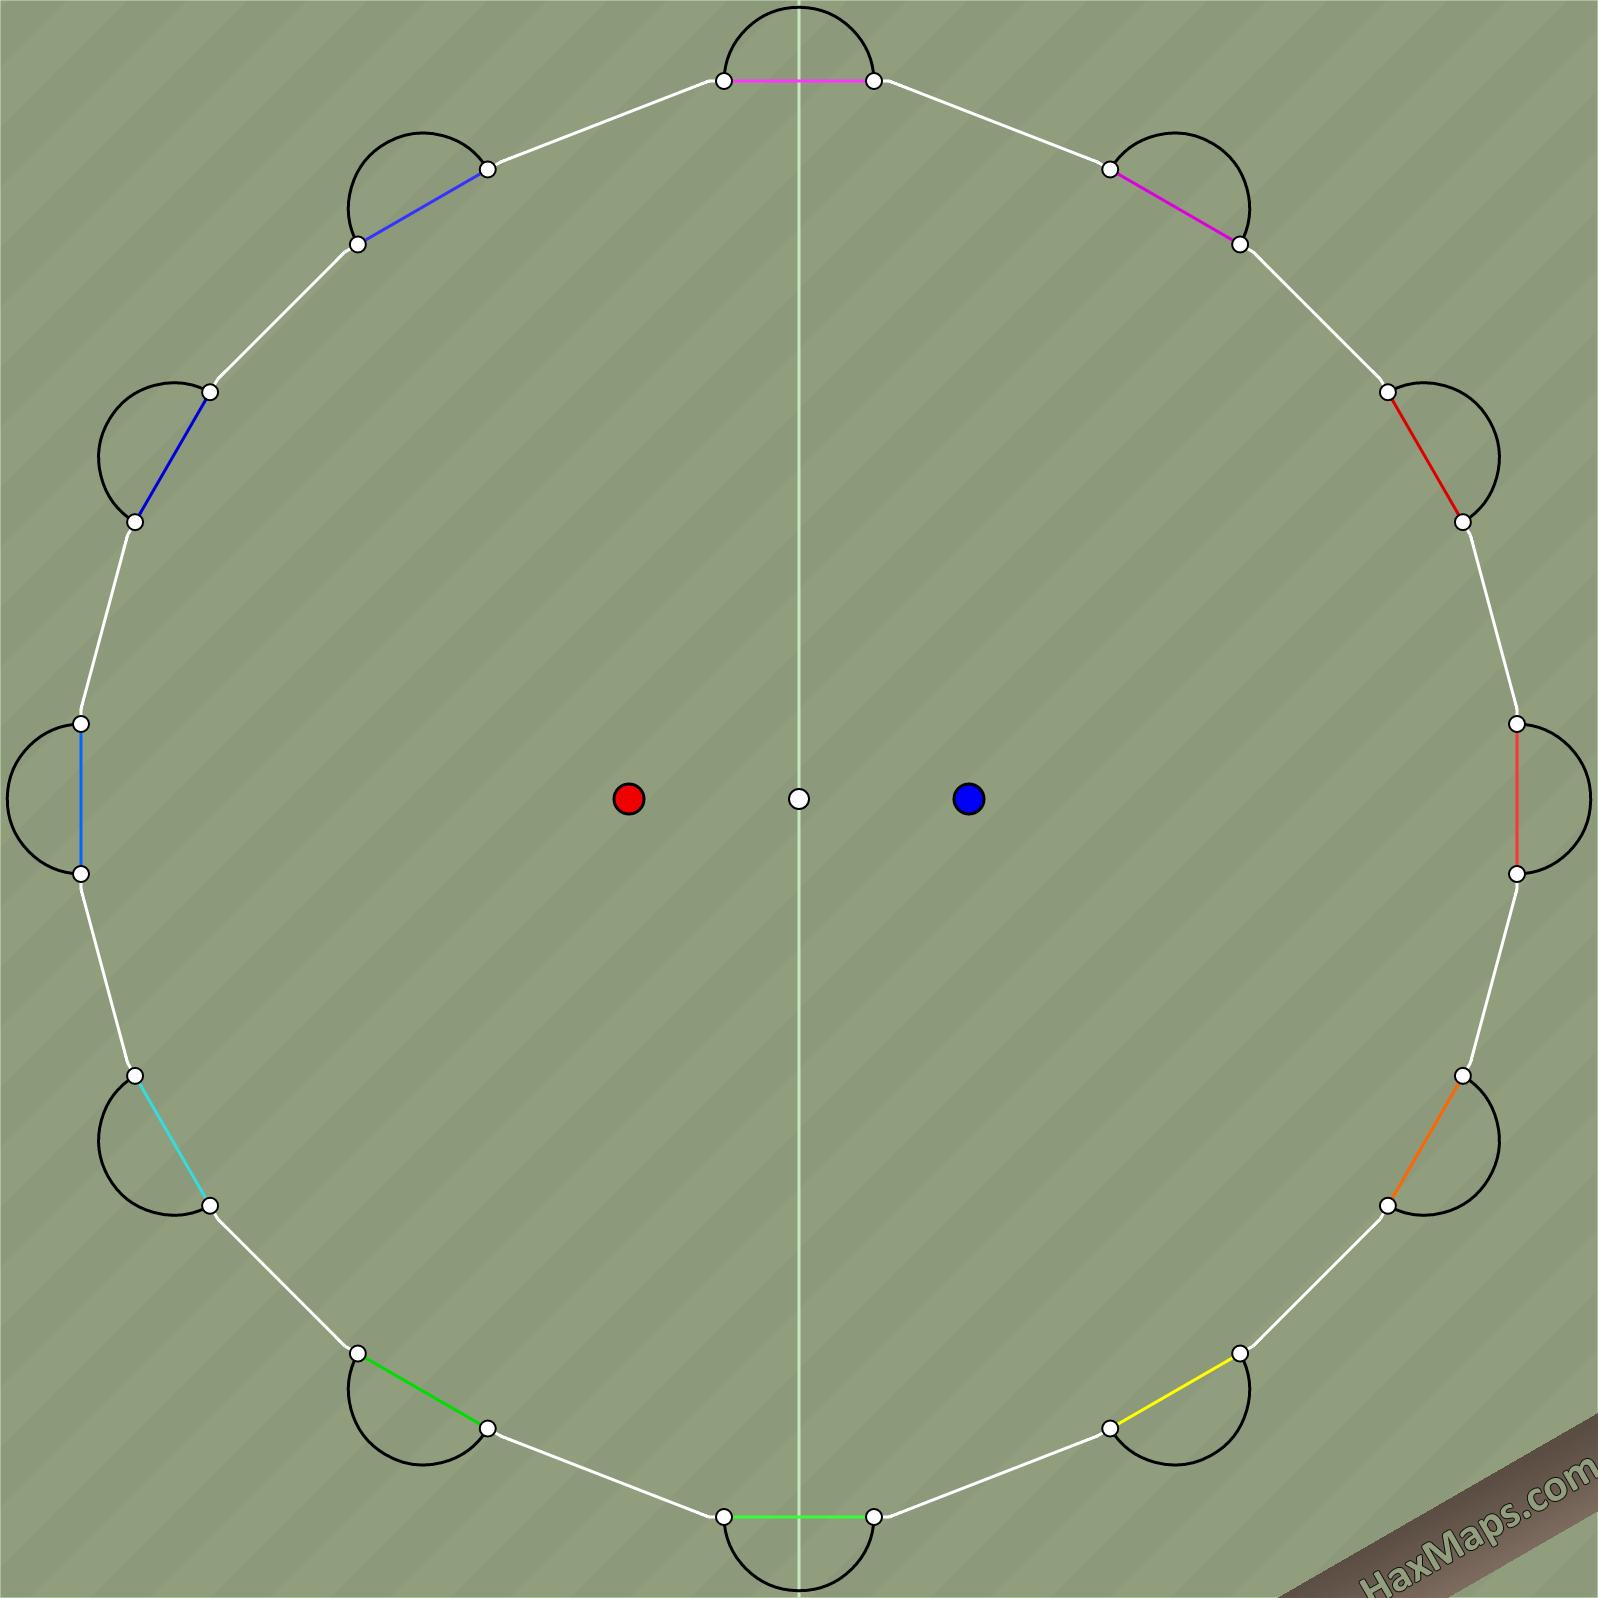 hax ball maps | v12 Power Japon by Jeysin